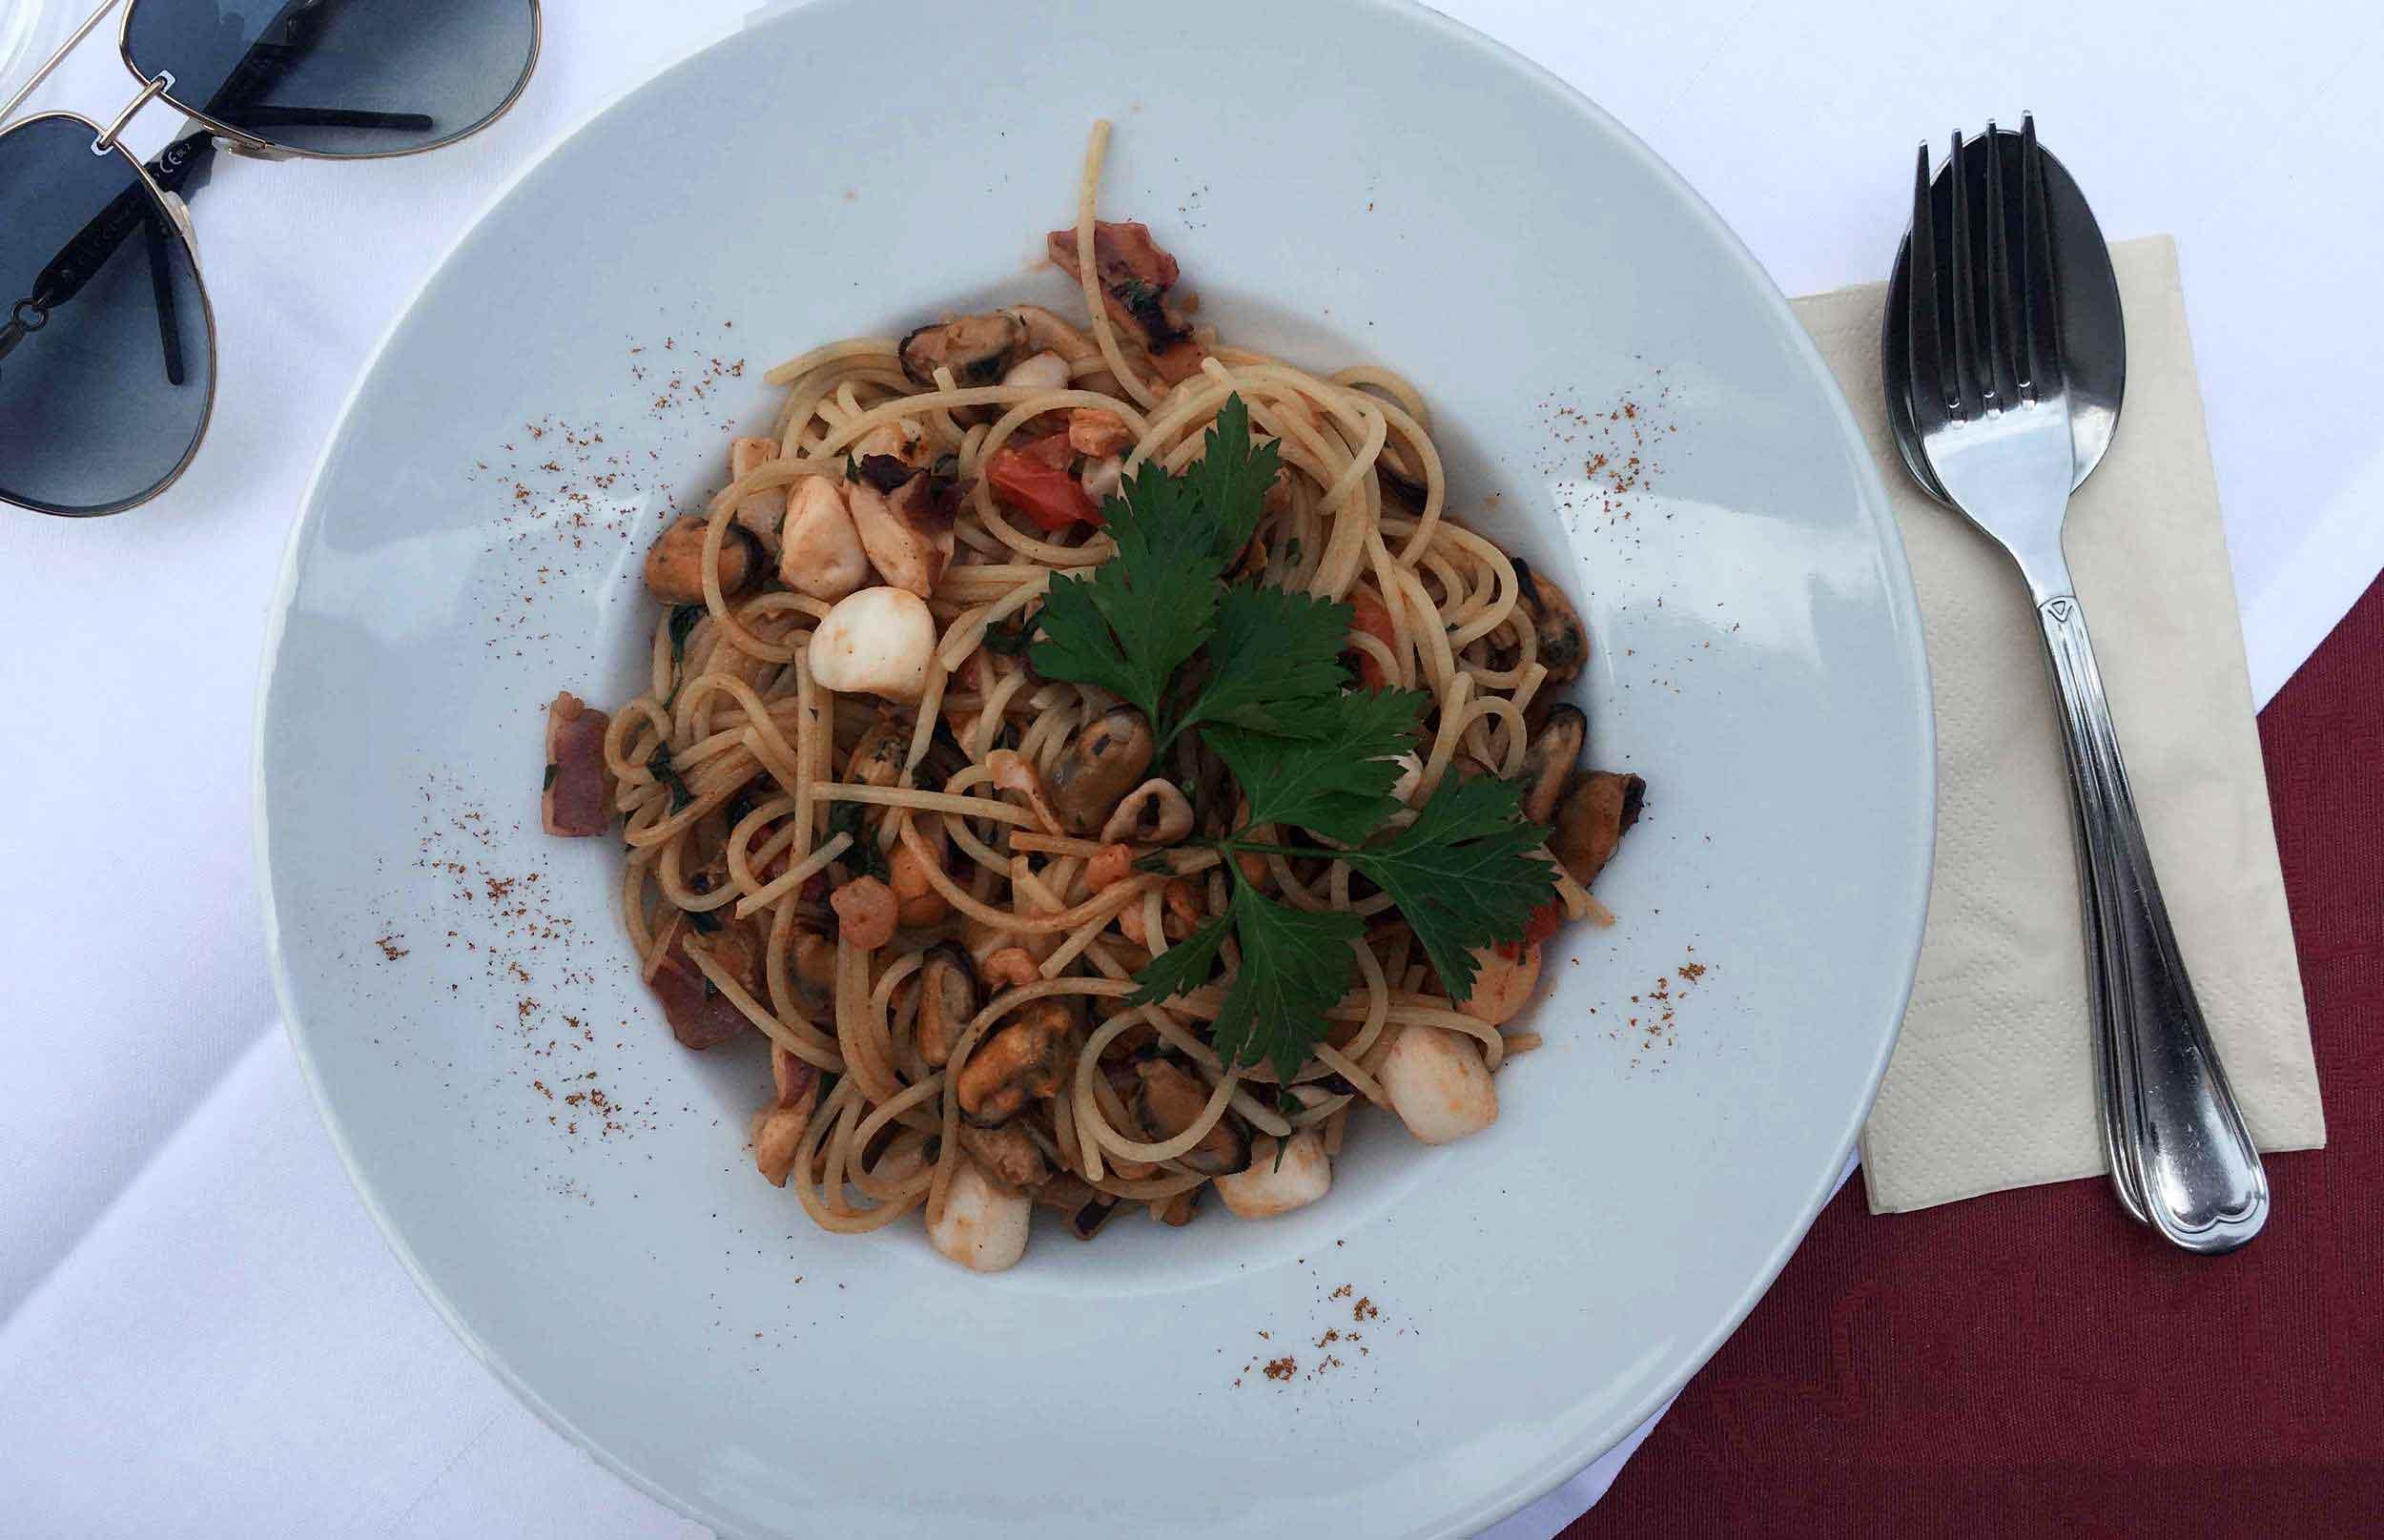 Italian food,Baden Baden, Germany. Image©thingstodot.com